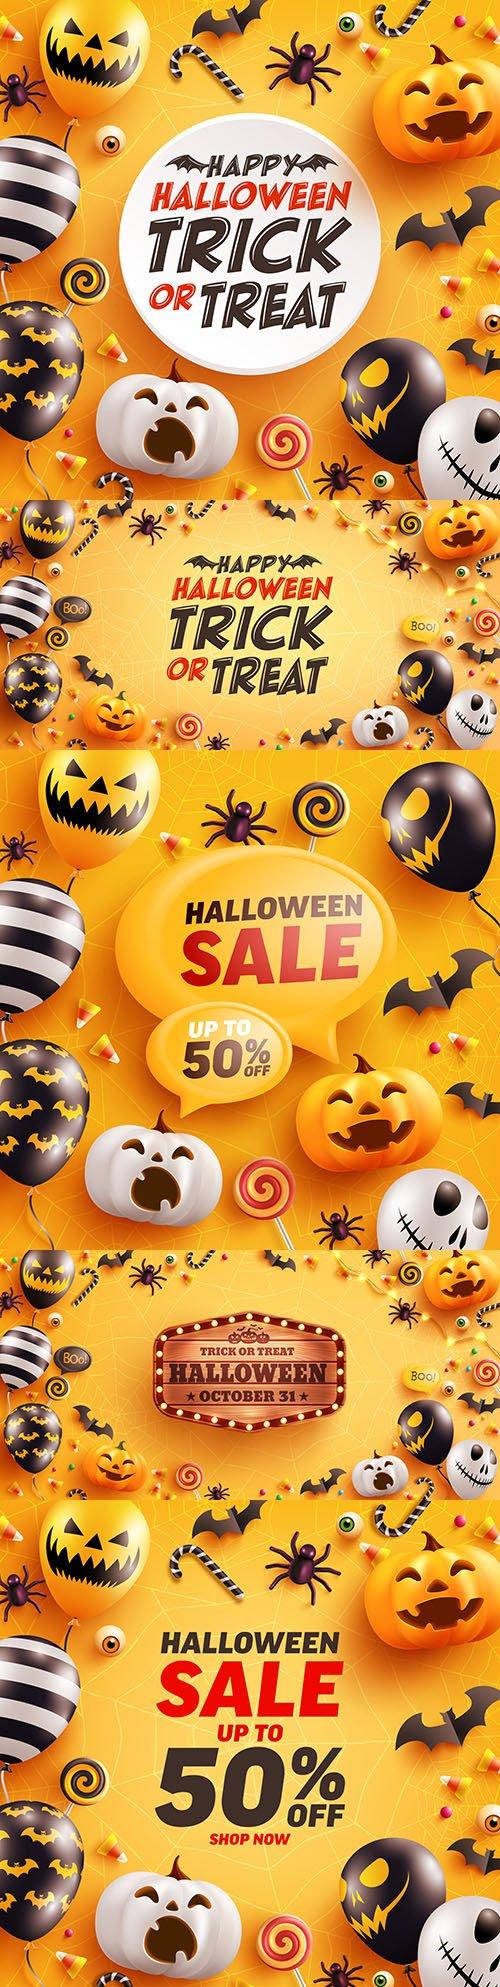 Halloween card with cute pumpkin, bat and candy